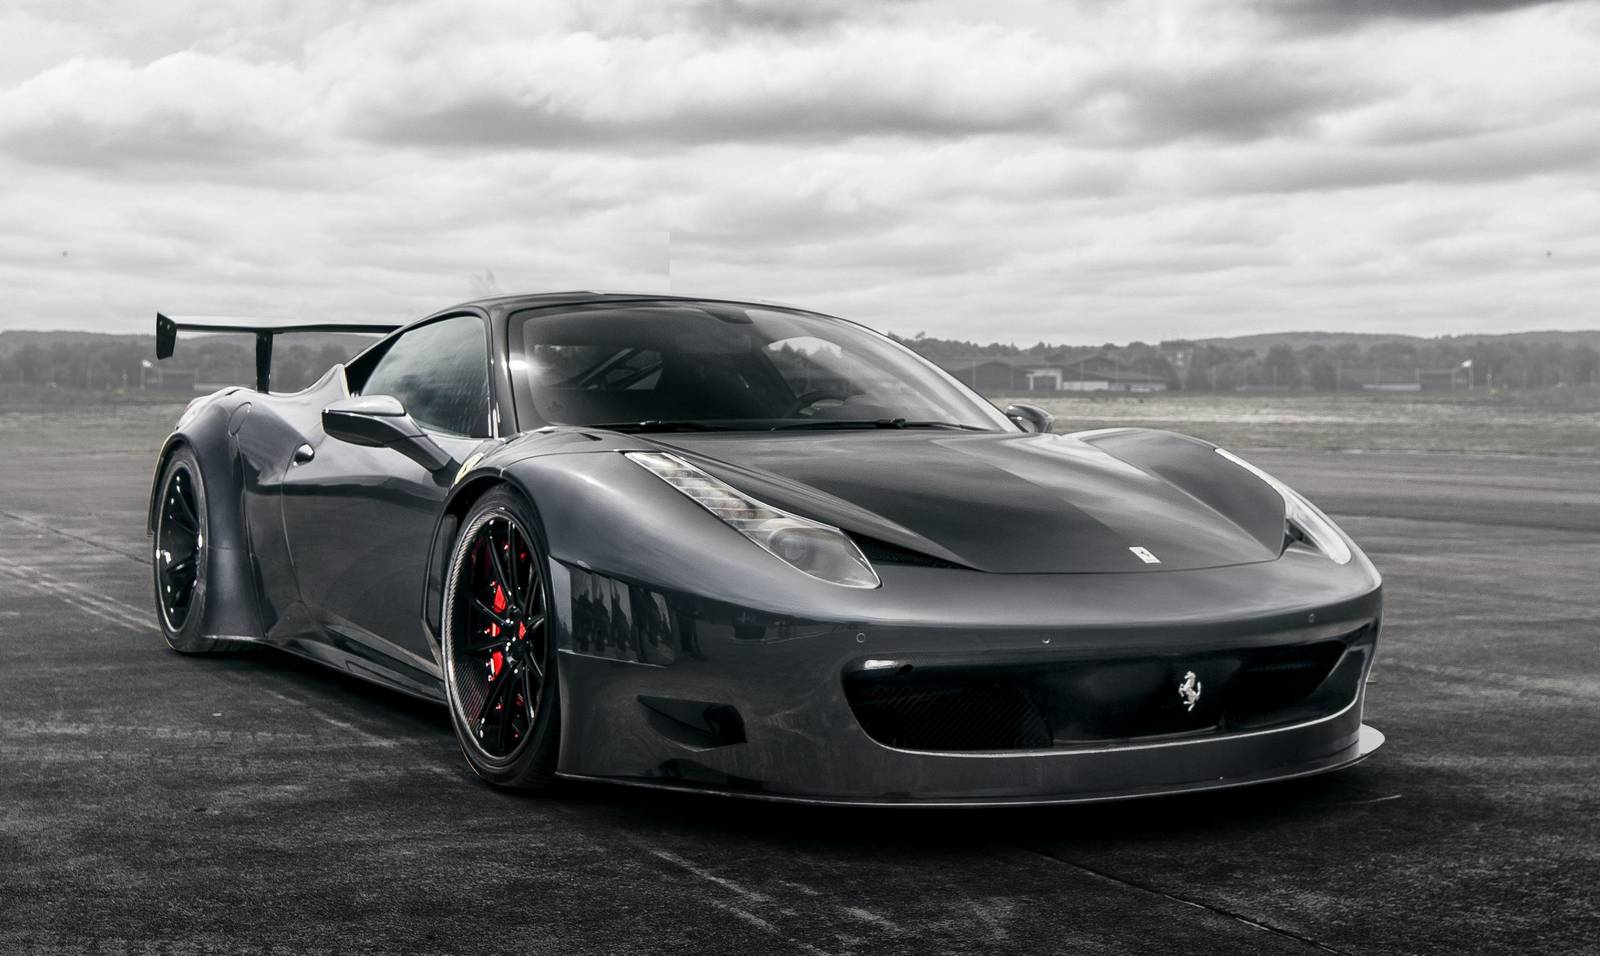 VAD Ferrari 458 Curseive GT3 тюнинг Vogue Auto Design и Gray Design